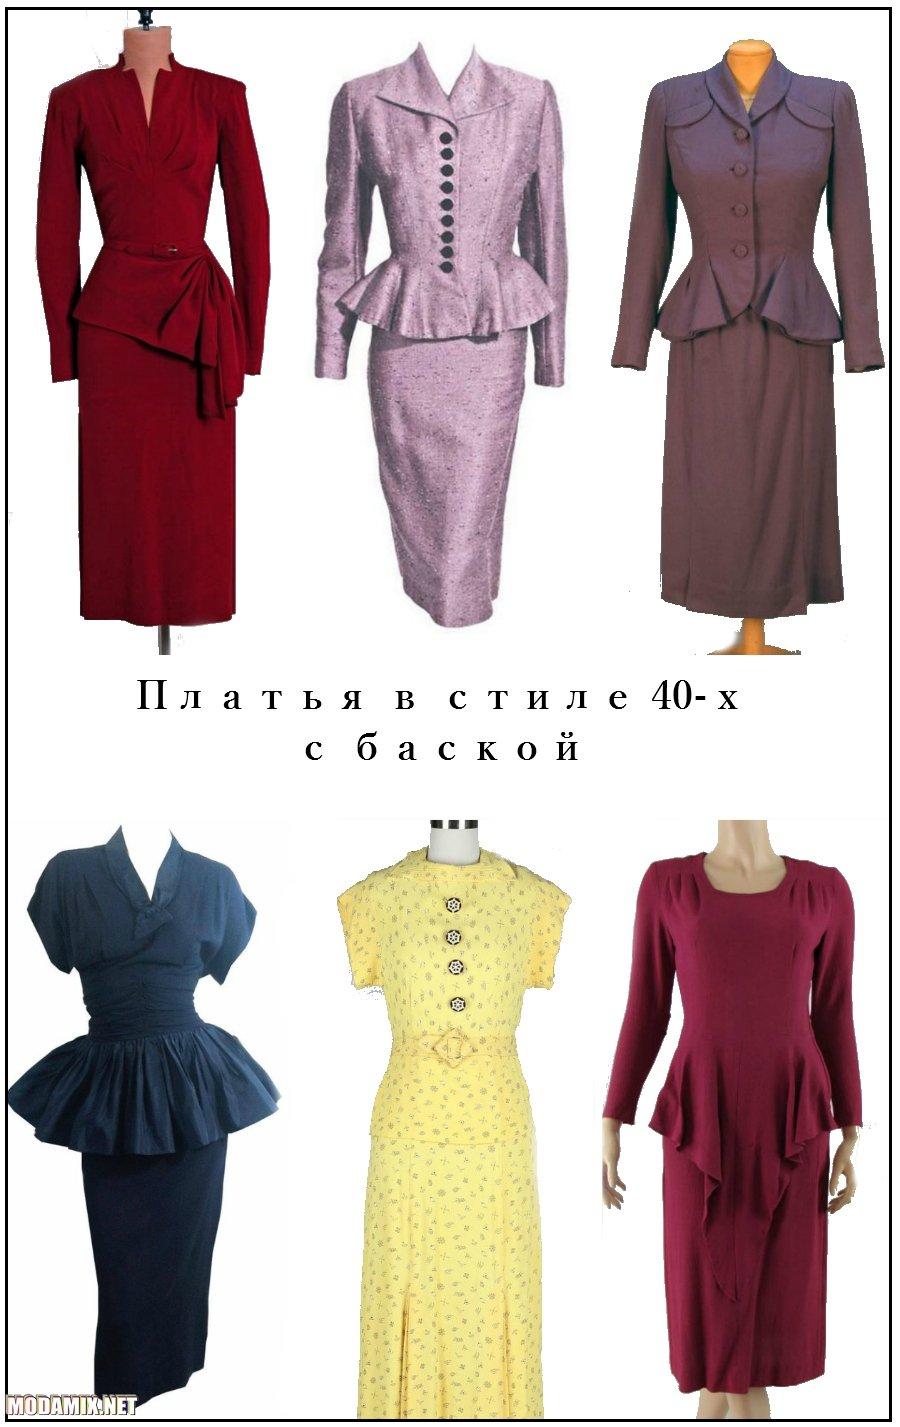 Фасон платьев 40-х с баской